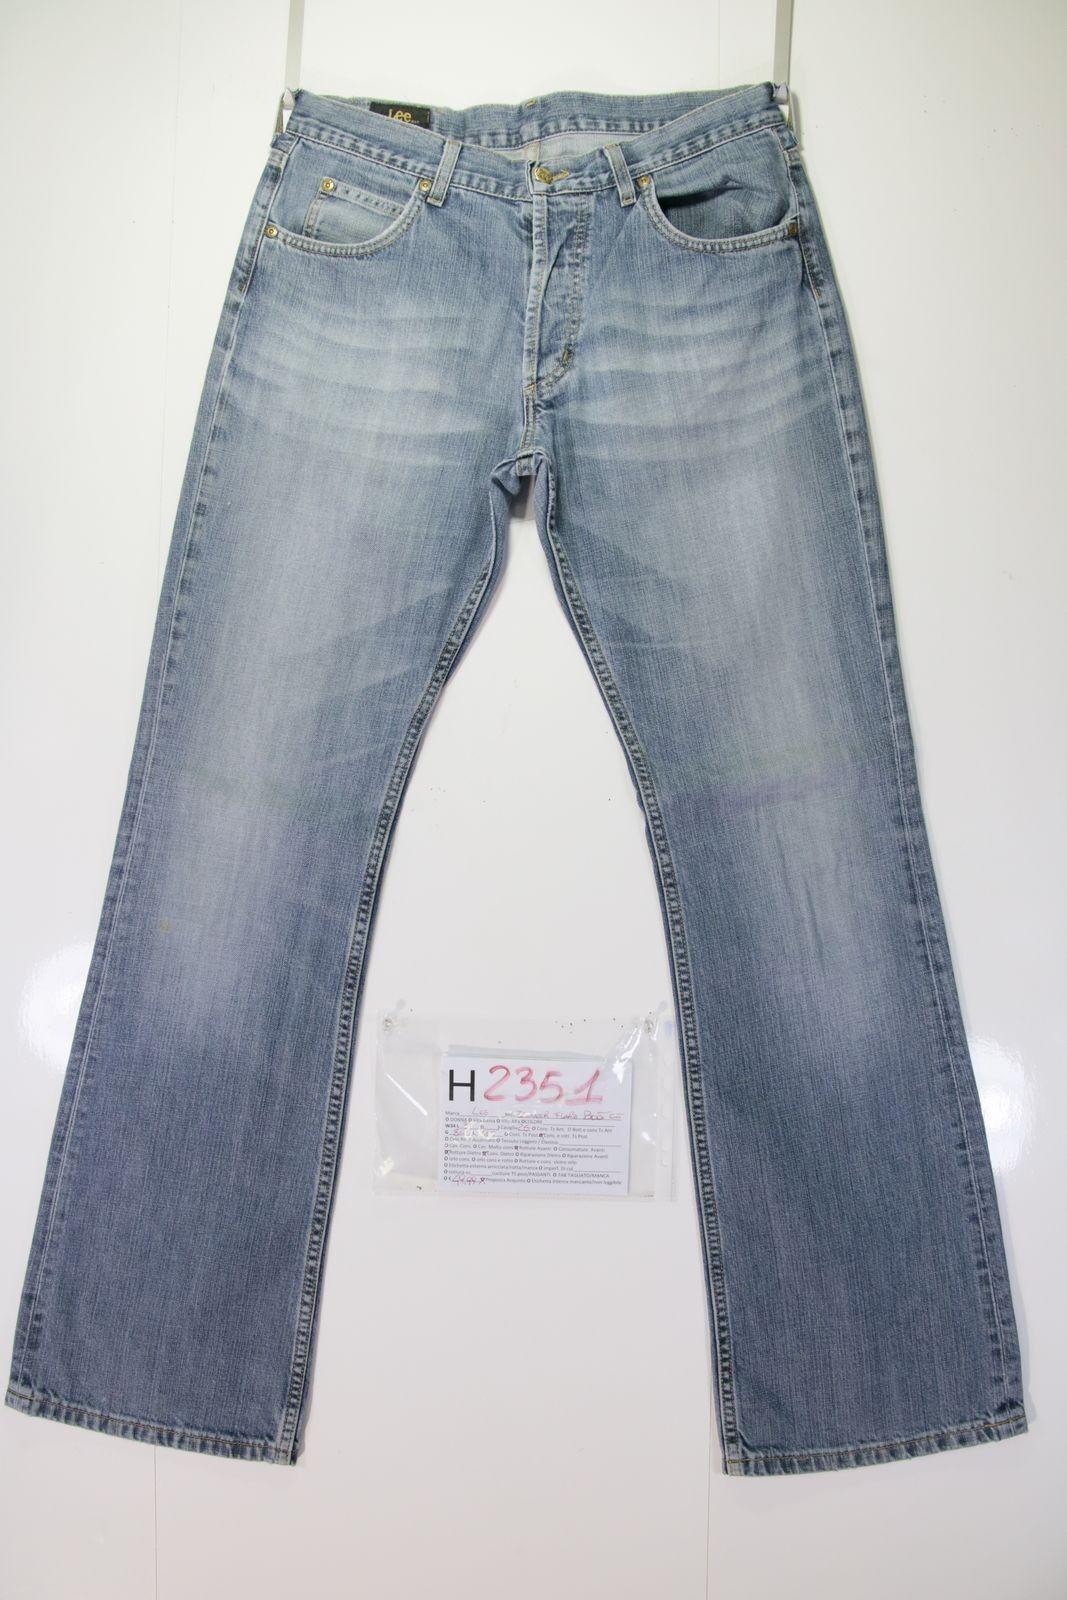 Lee Denver Flare Bootcut(Cod. H2351) Tg48 W34 L34 jeans used Vintage Streetwear